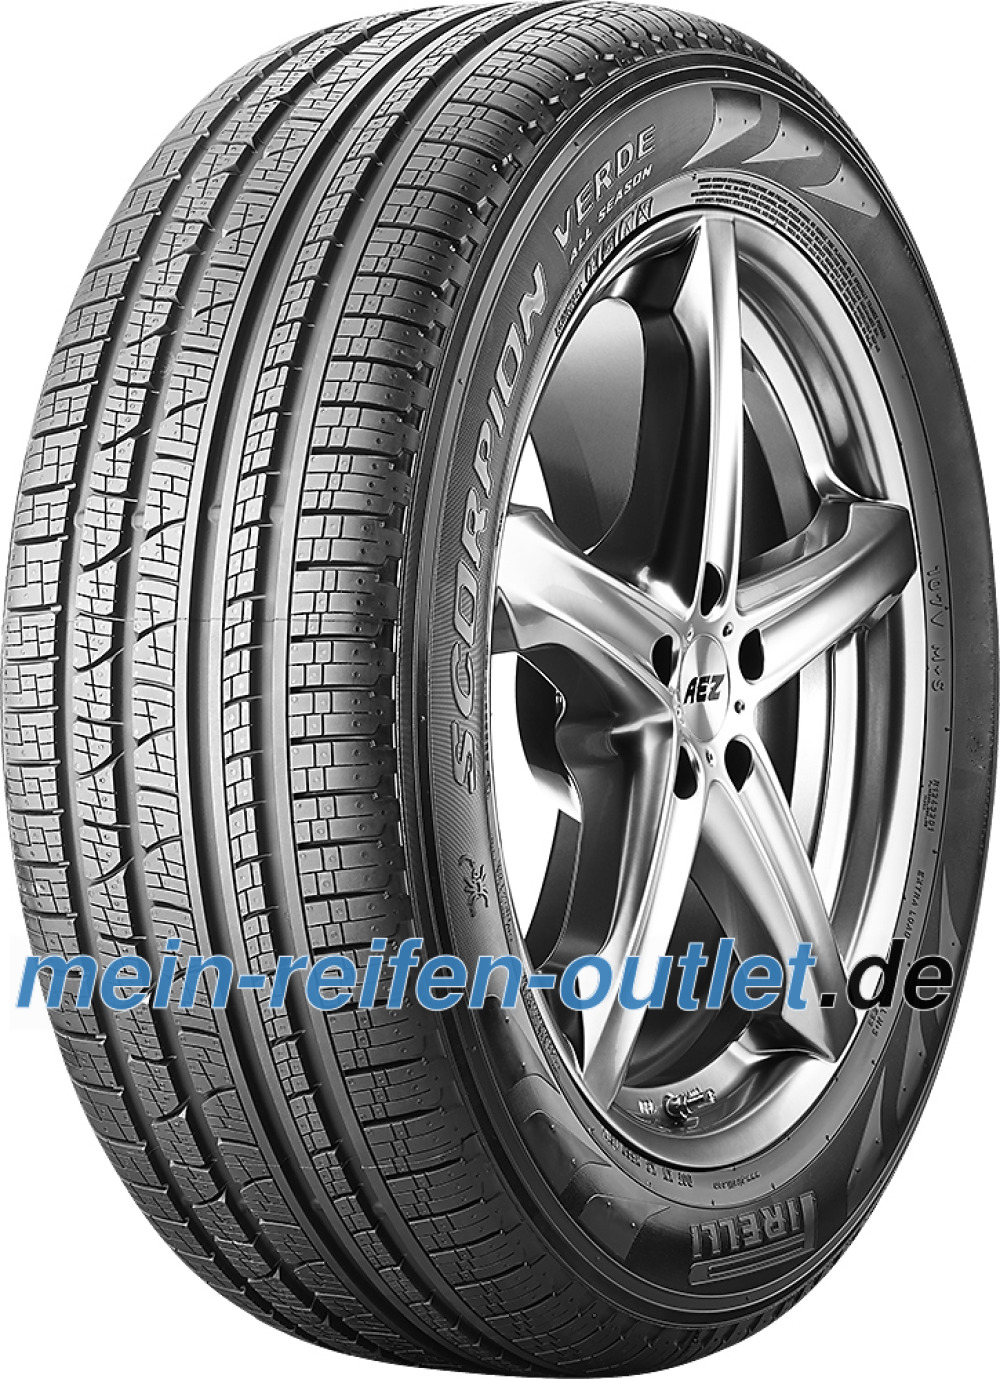 Pirelli Scorpion Verde All-Season ( 255/55 R20 110Y XL , LR, ECOIMPACT, mit Felgenschutz (MFS) )